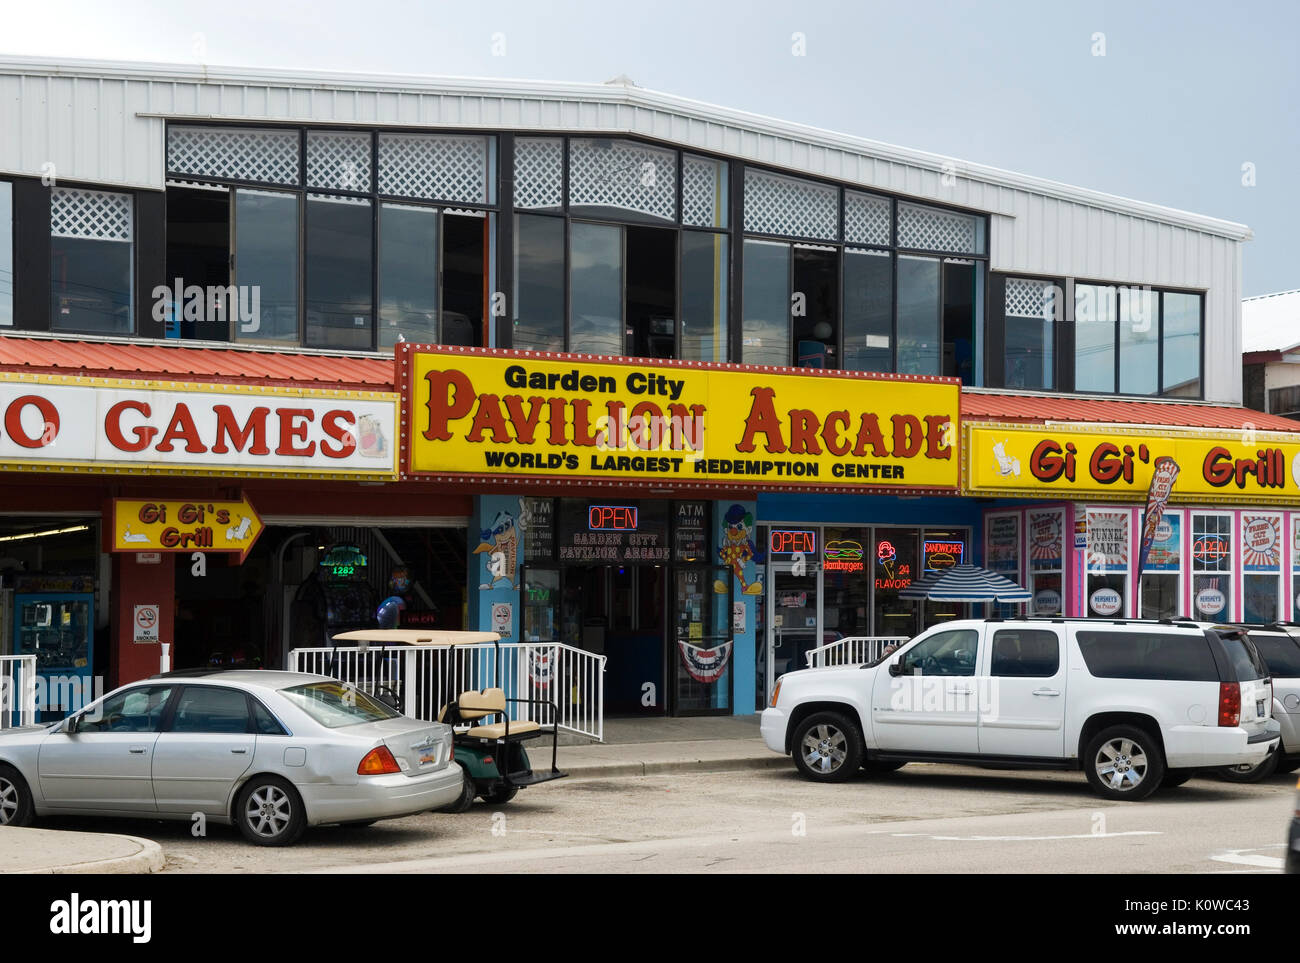 Pavilion Arcade Garden City South Carolina USA. - Stock Image